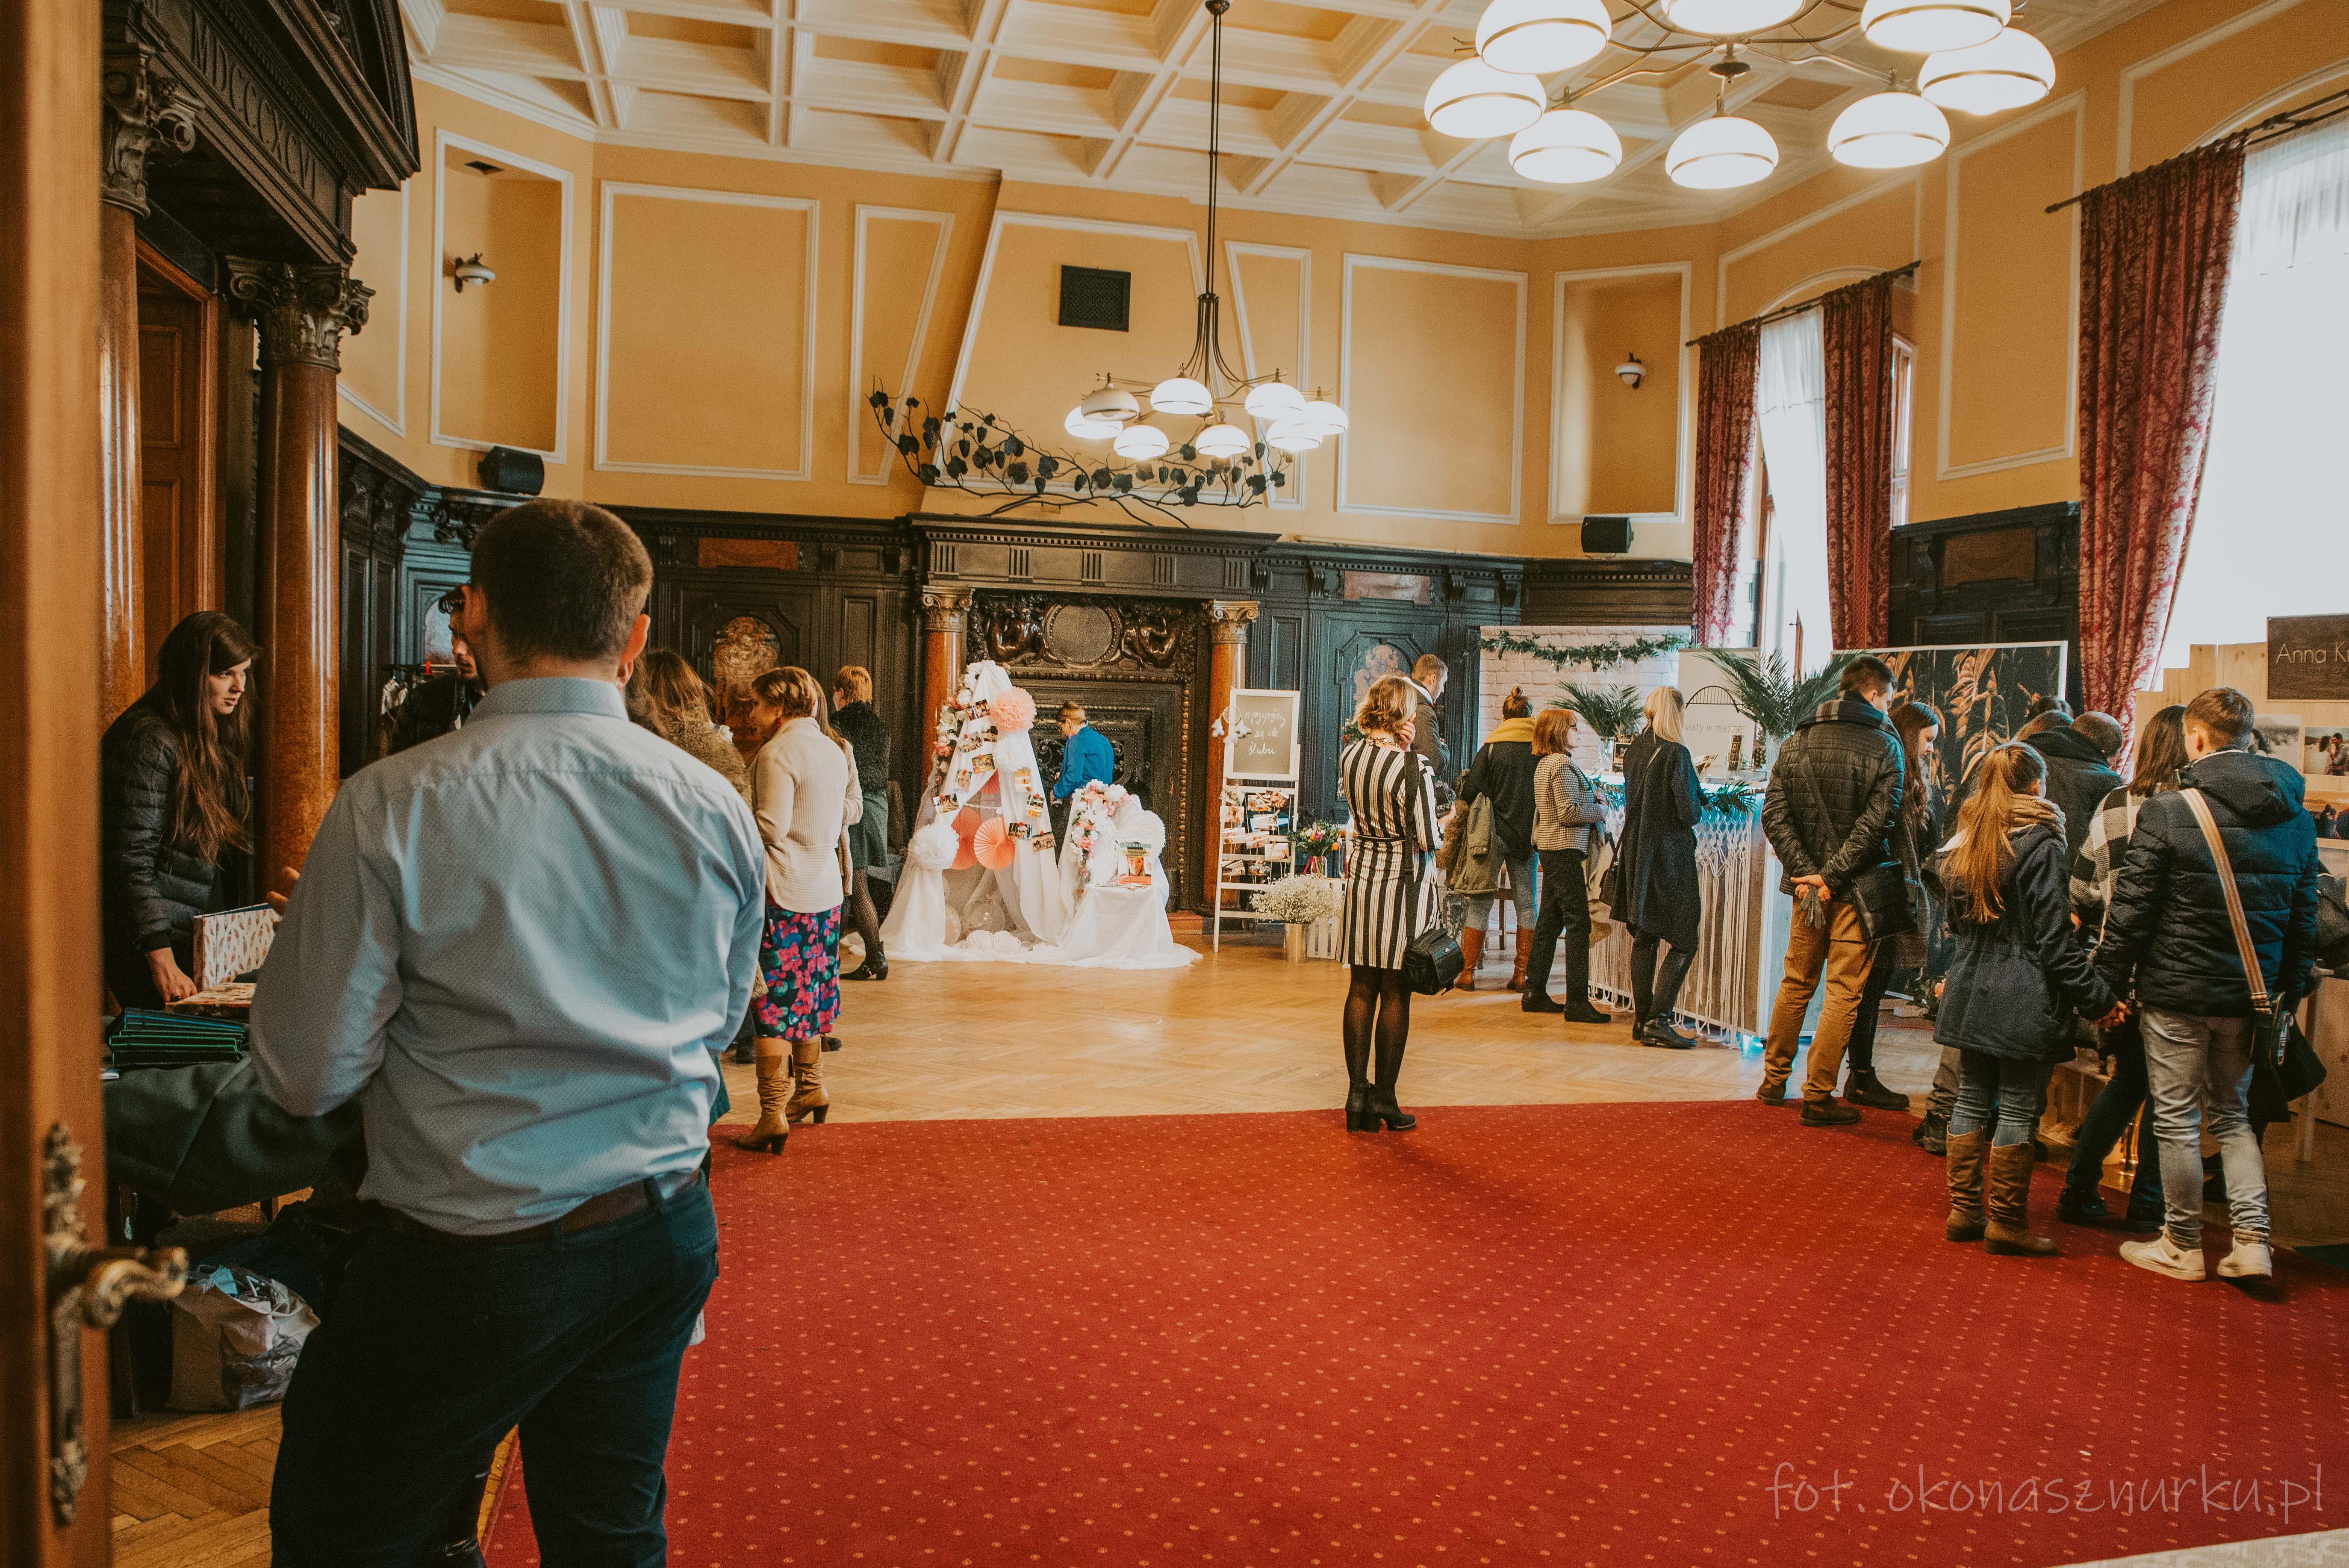 concept-weddings-okonasznurku-fotografia (16)